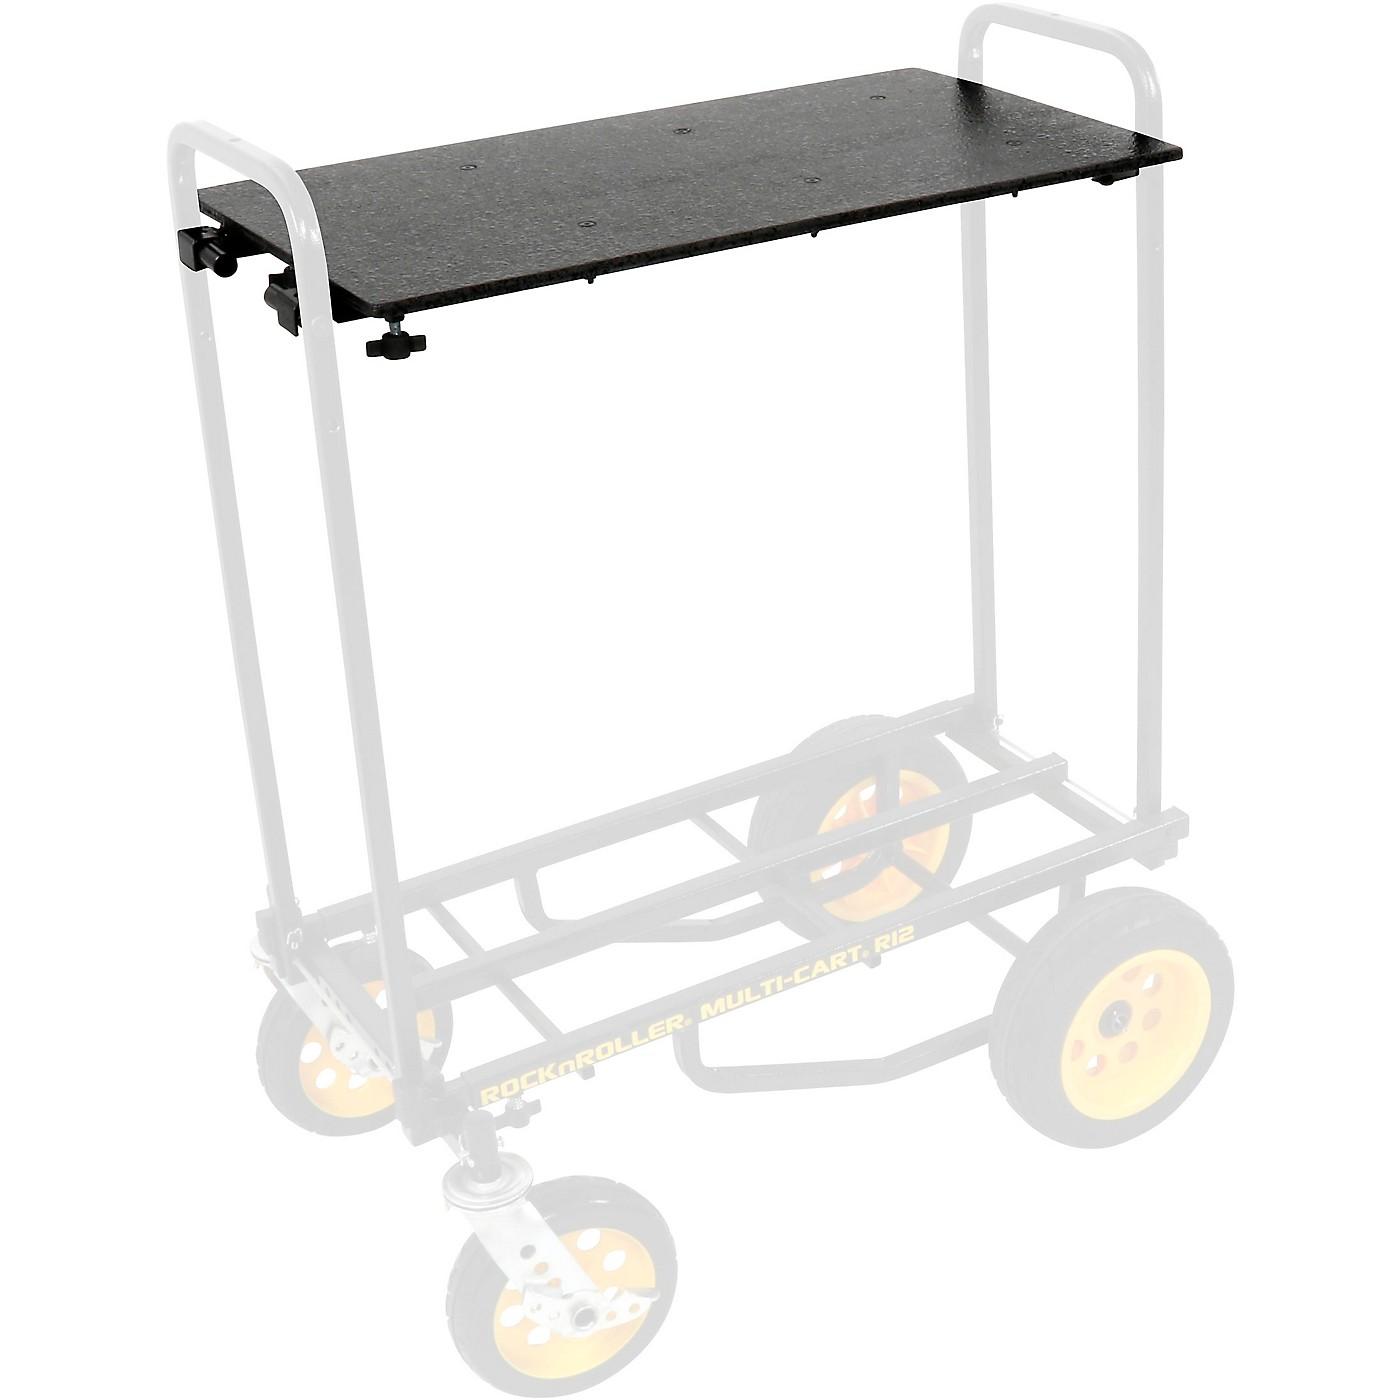 Rock N Roller RSH10Q Quick-Set Shelf for R8, R10, R11G, R12 Carts thumbnail